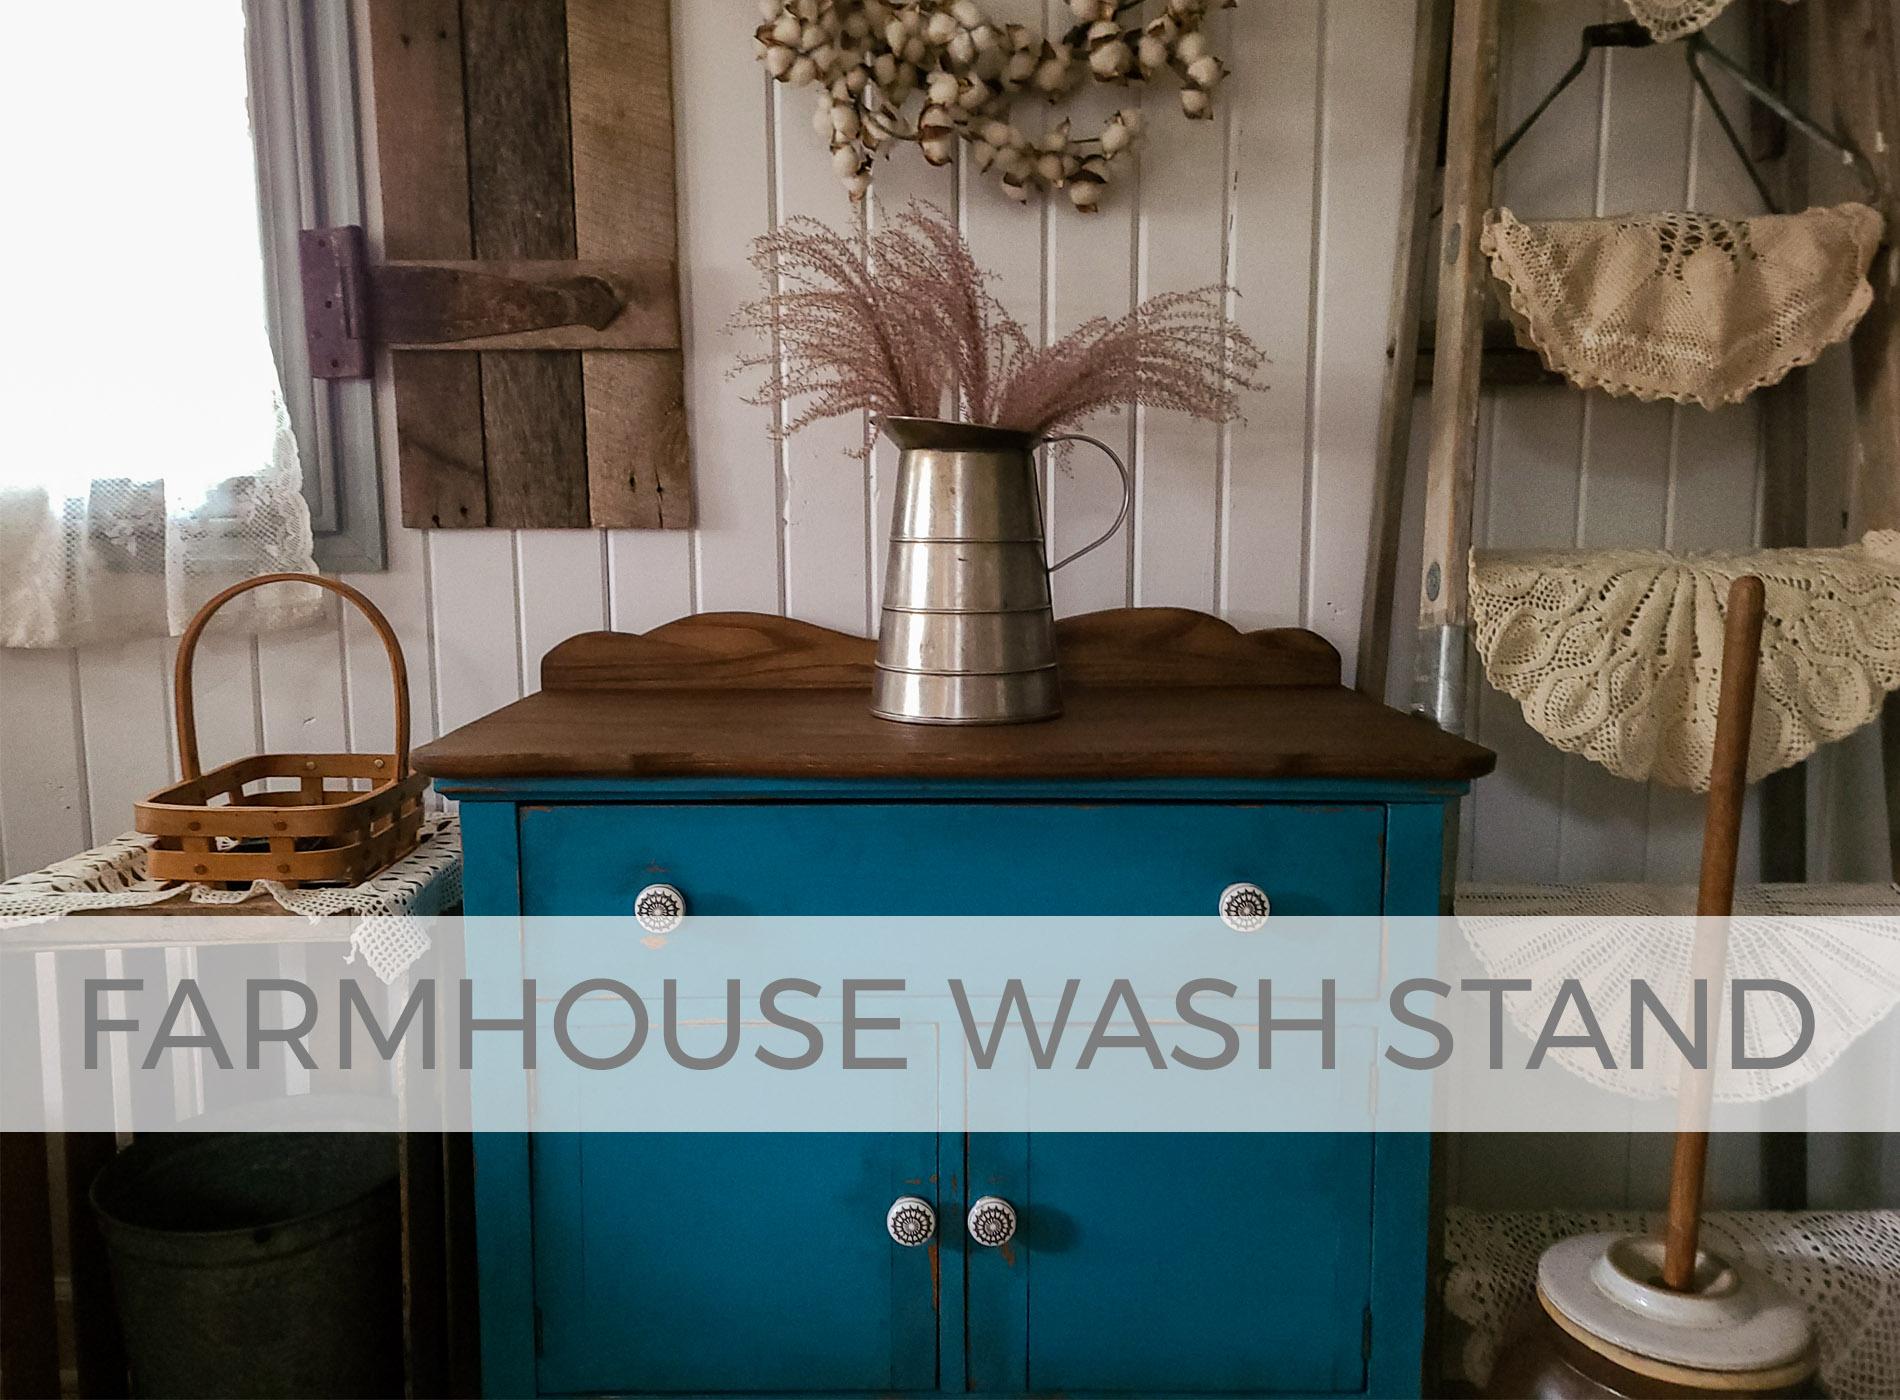 Antique Farmhouse Wash Stand by Larissa of Prodigal Pieces | prodigalpieces.com